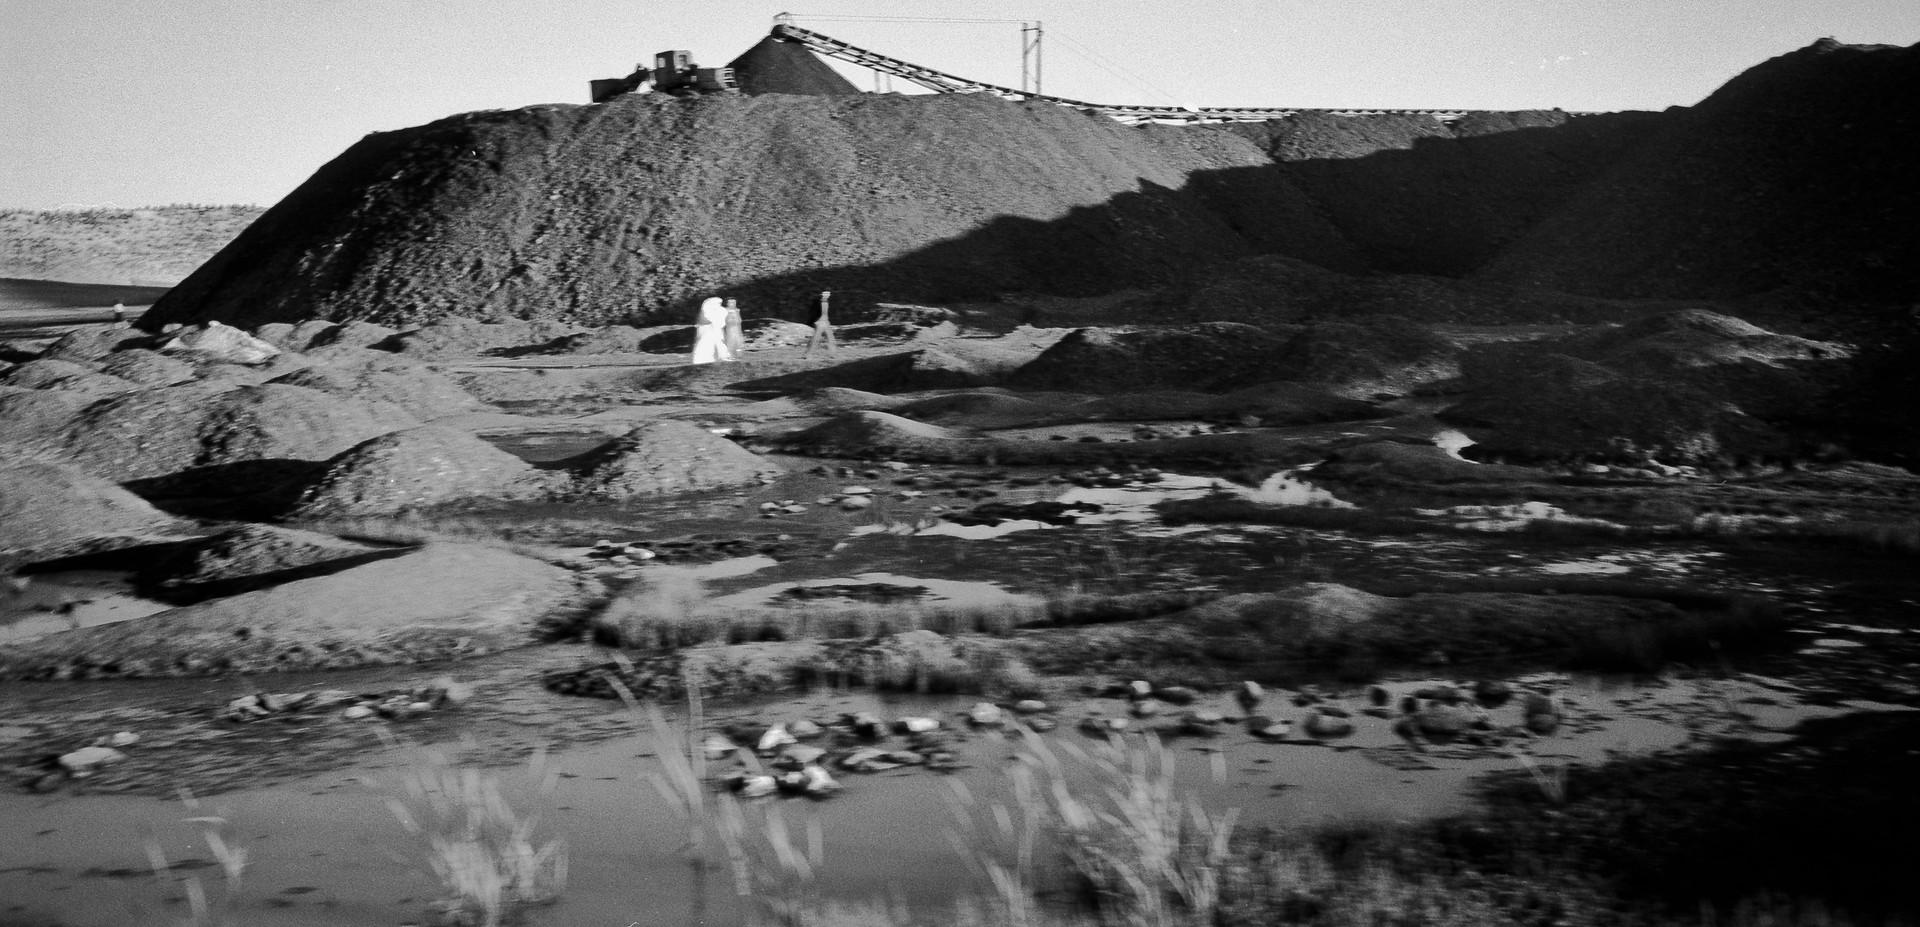 Jerada, Morocco 1986